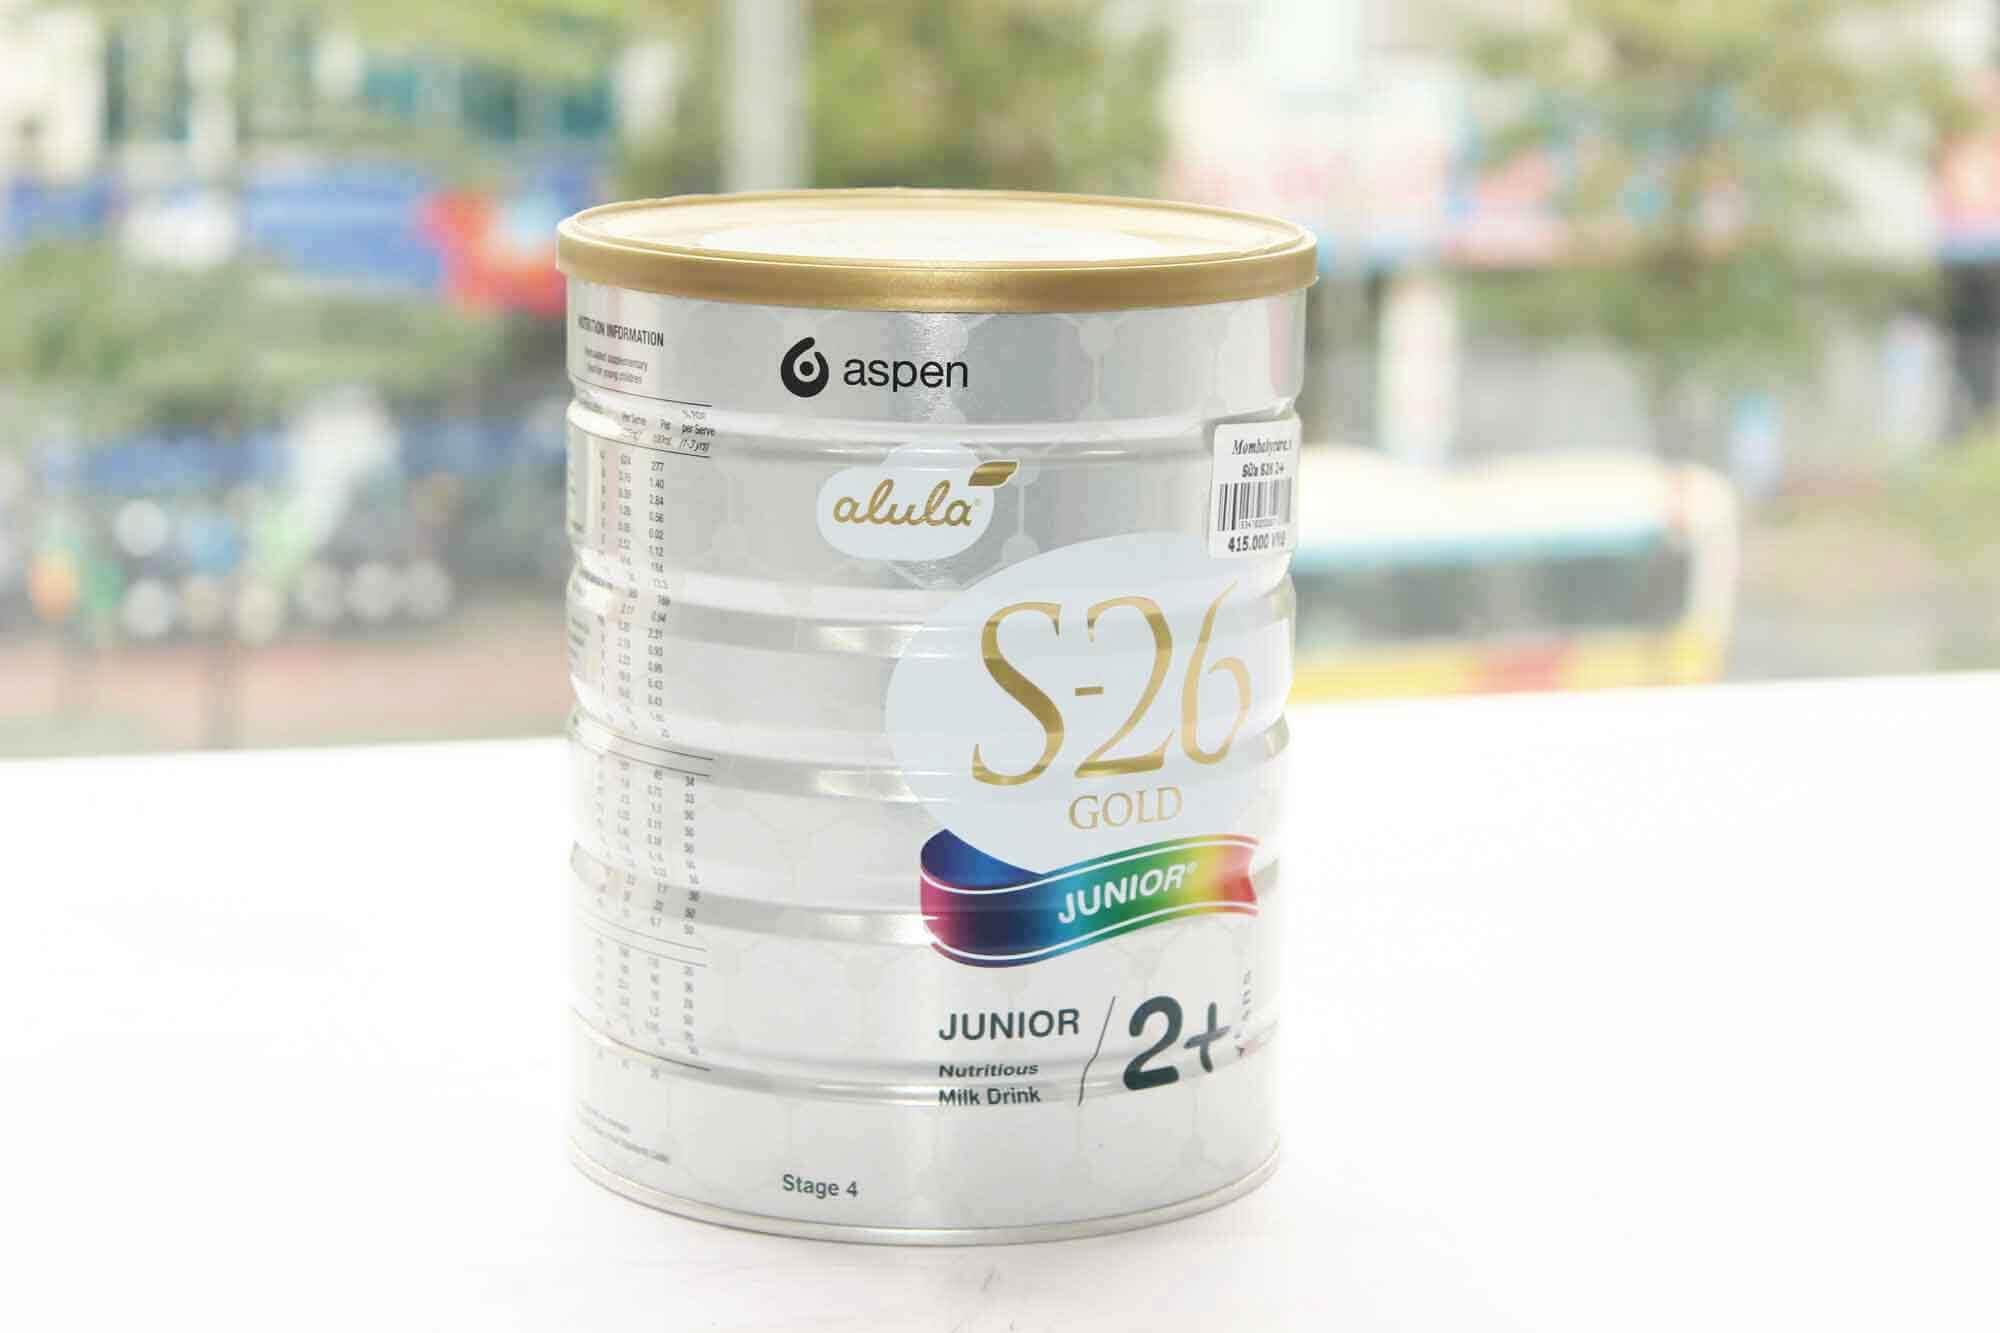 Sữa s26 số 2+ cho bé trên 2 tuổi